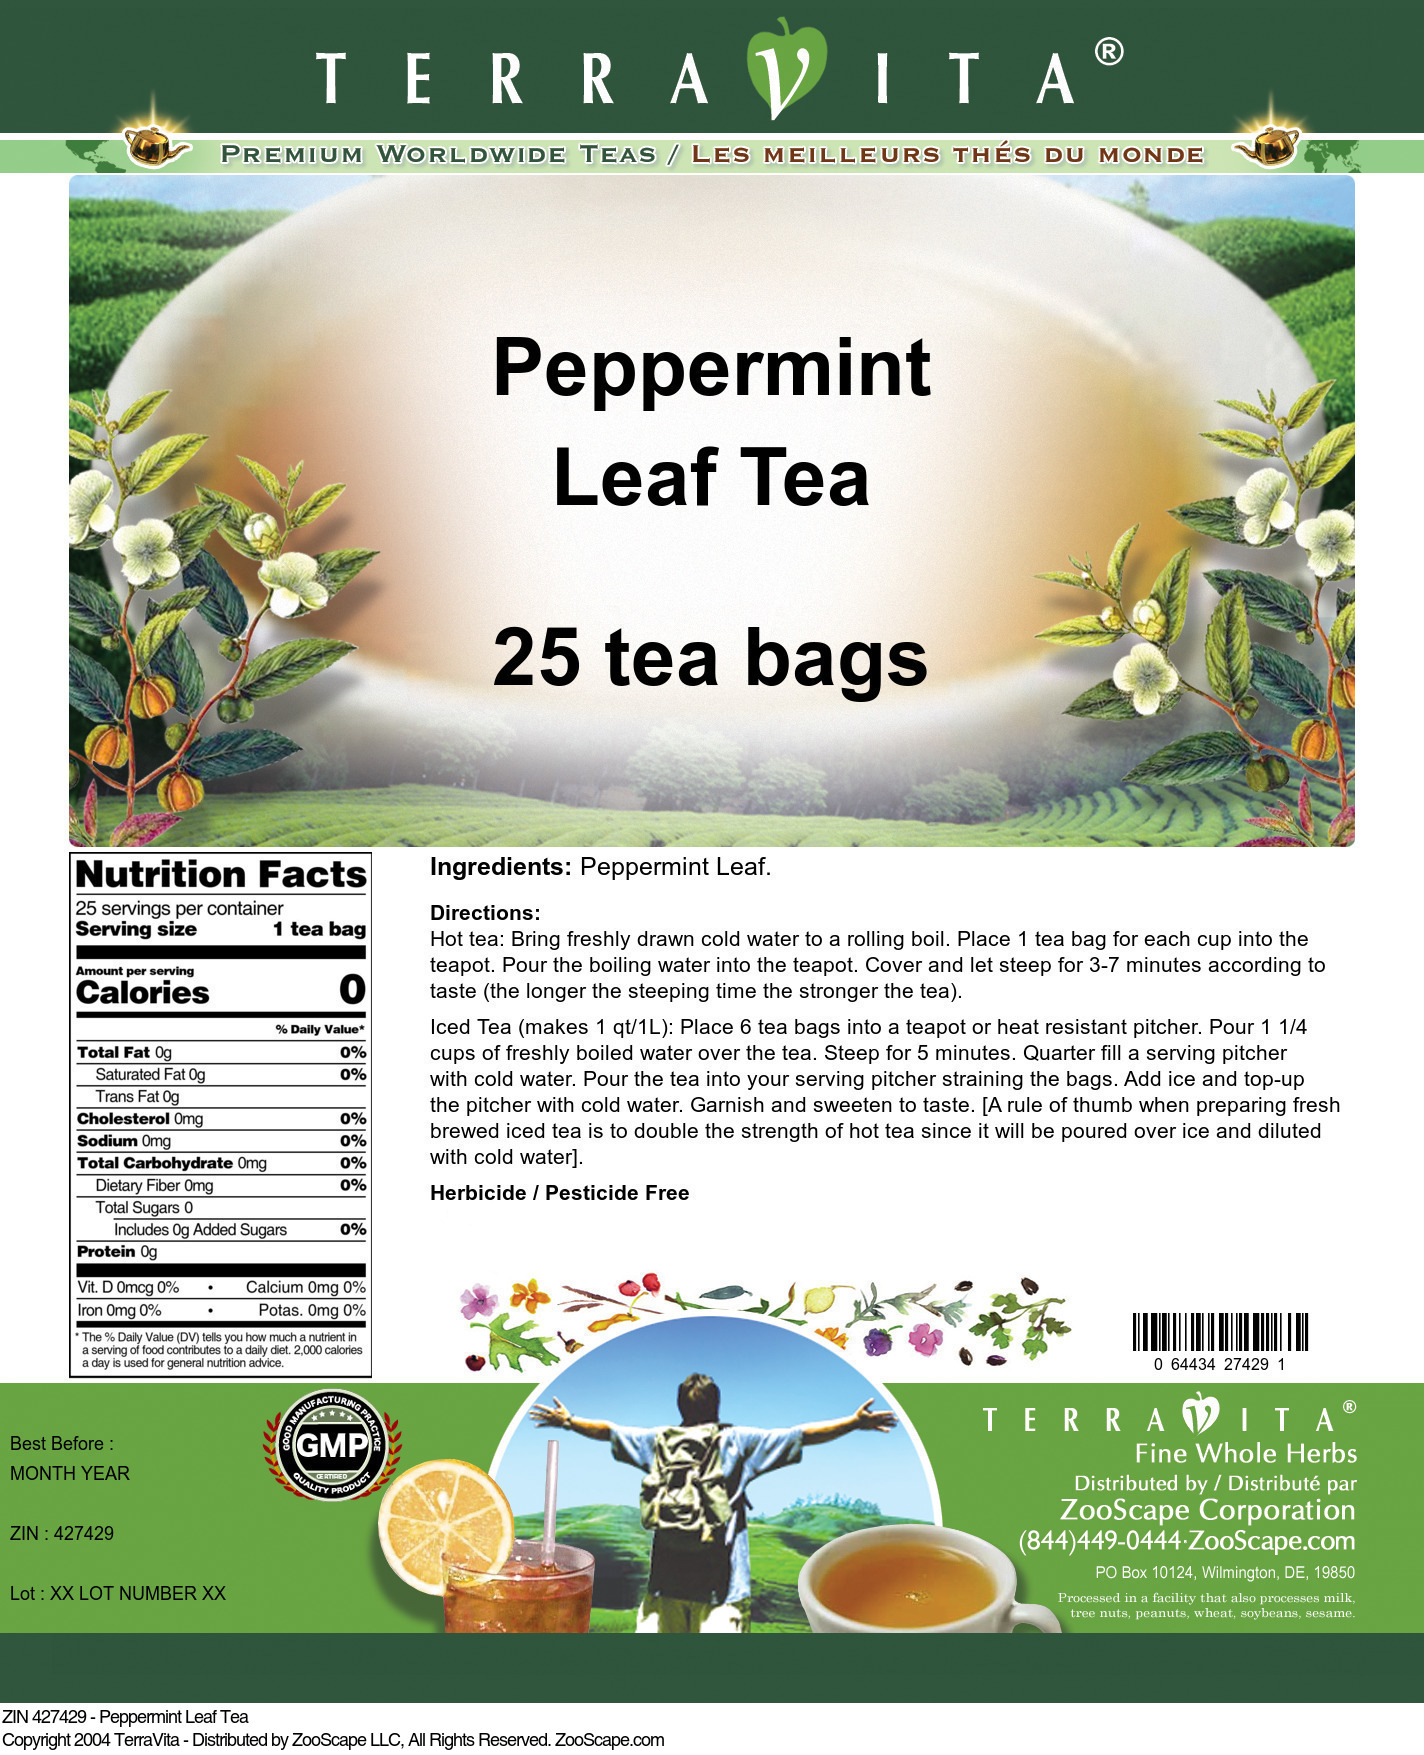 Peppermint Leaf Tea